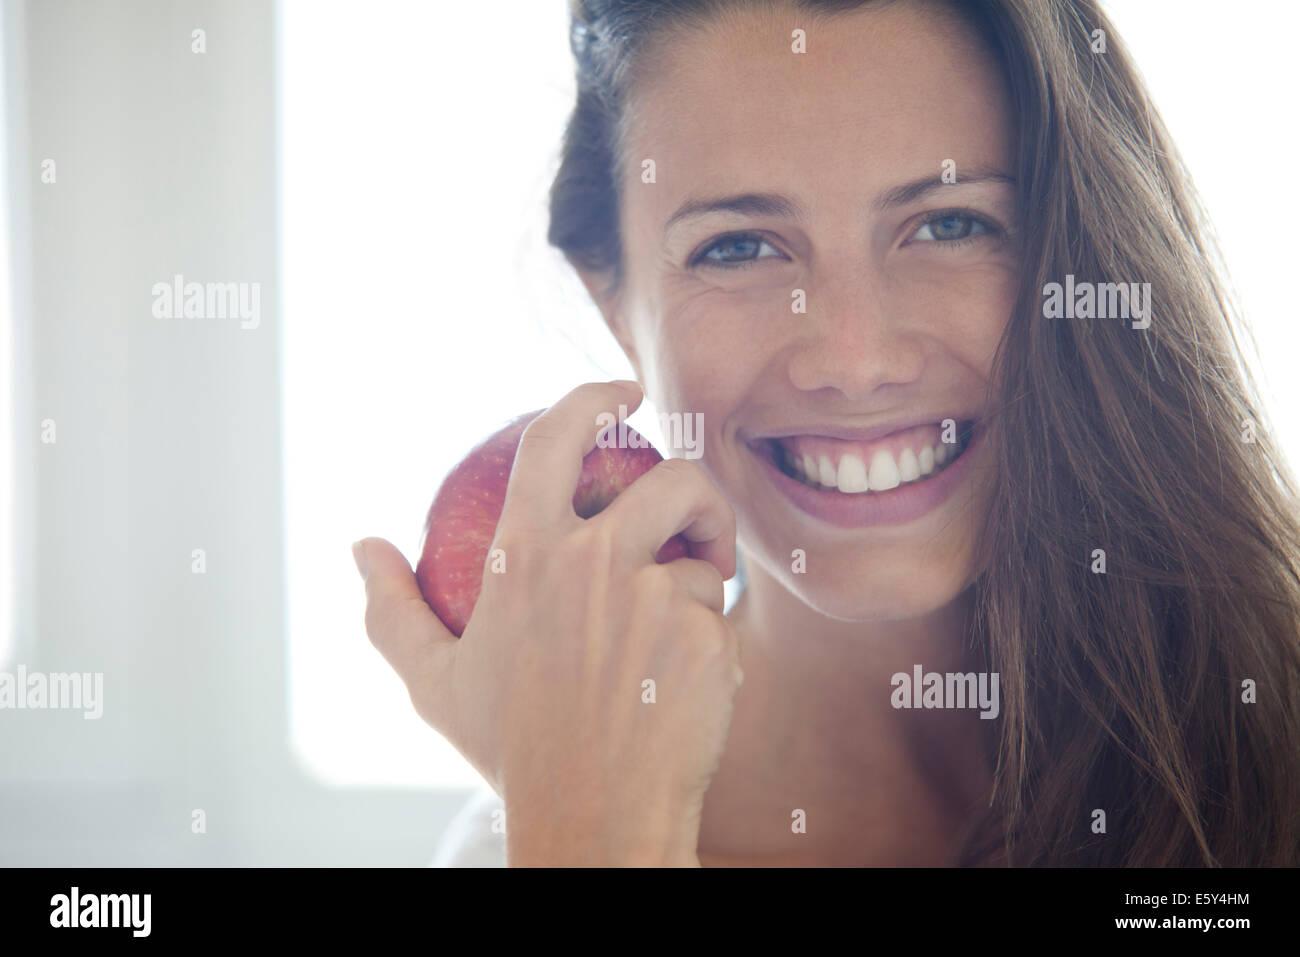 Woman holding apple, portrait Photo Stock